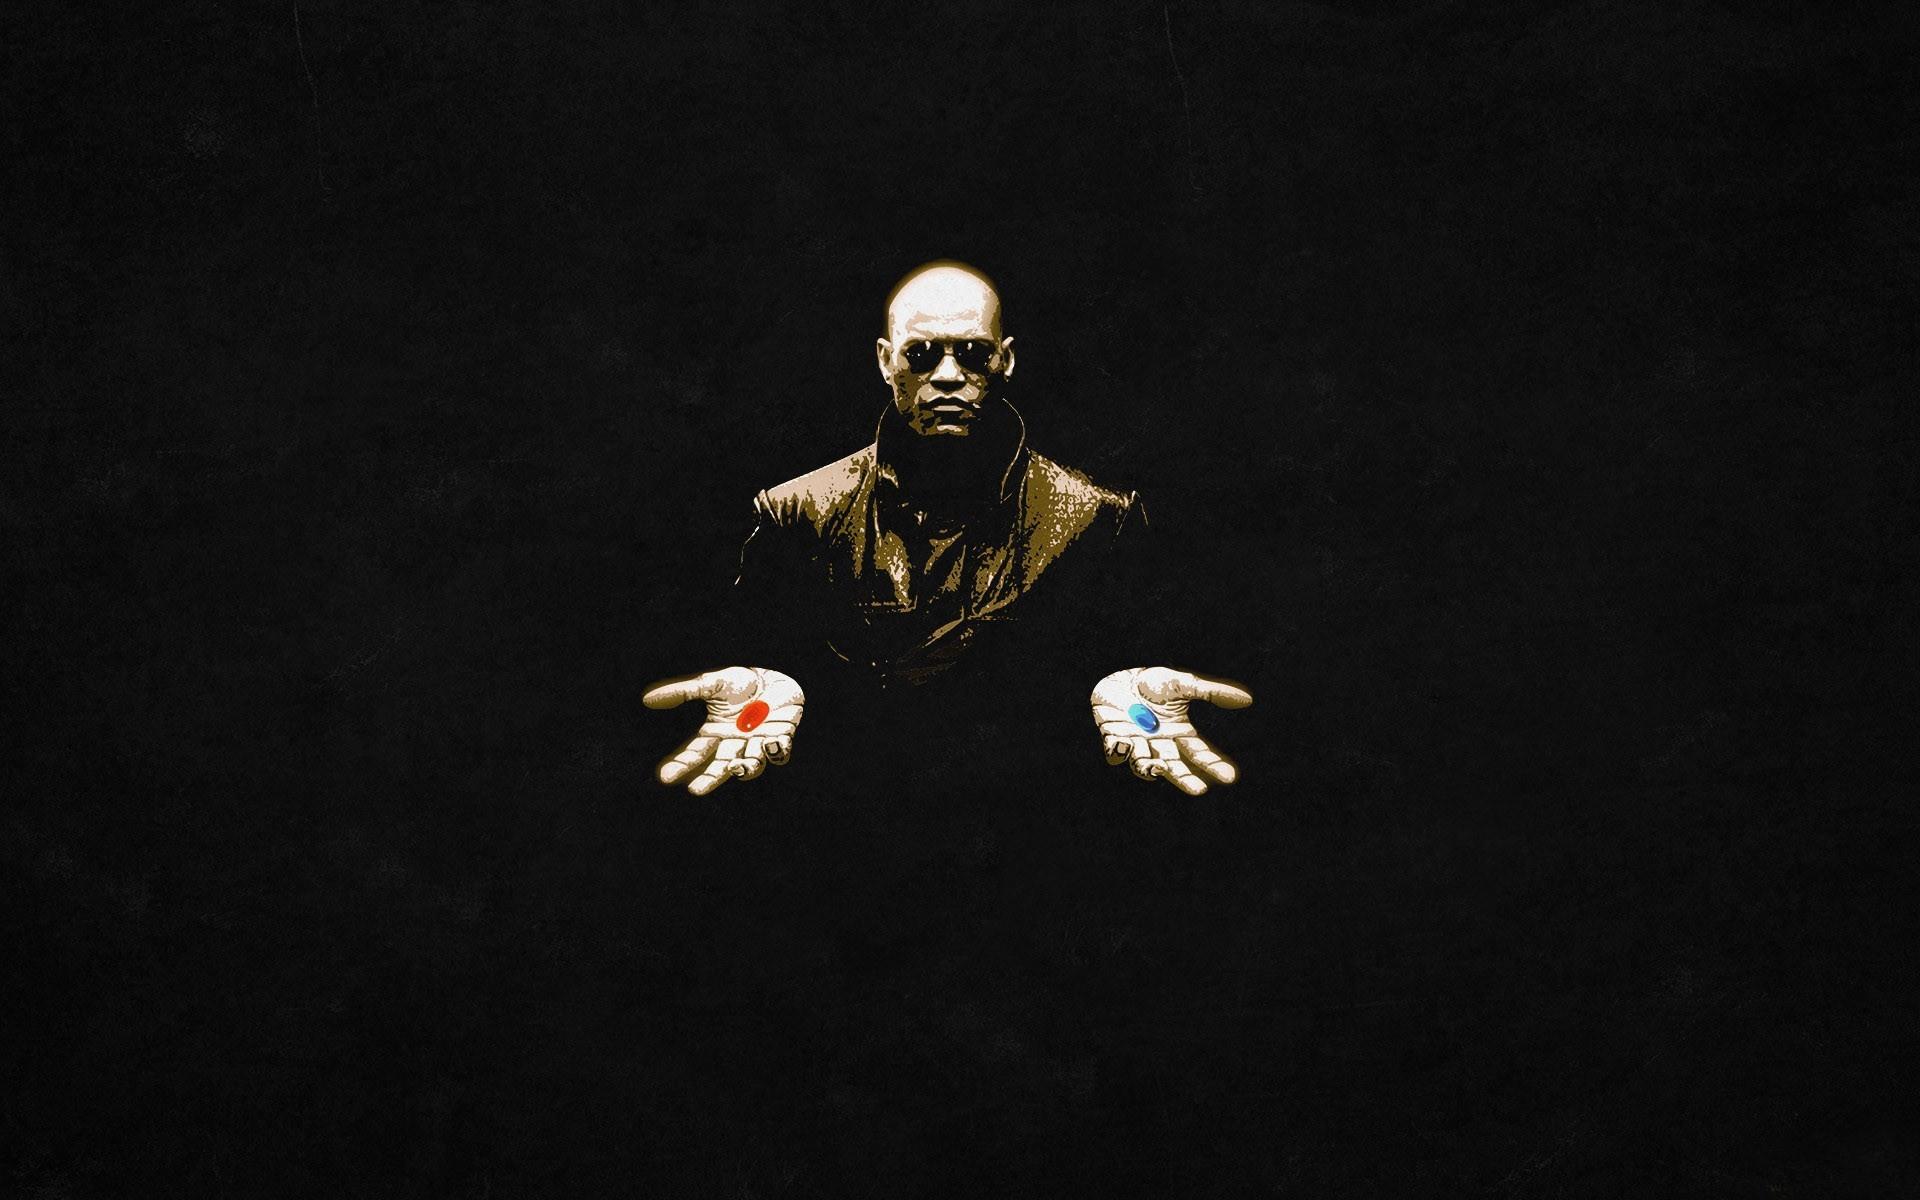 General 1920x1200 science fiction Morpheus black The Matrix pills Laurence Fishburne movies